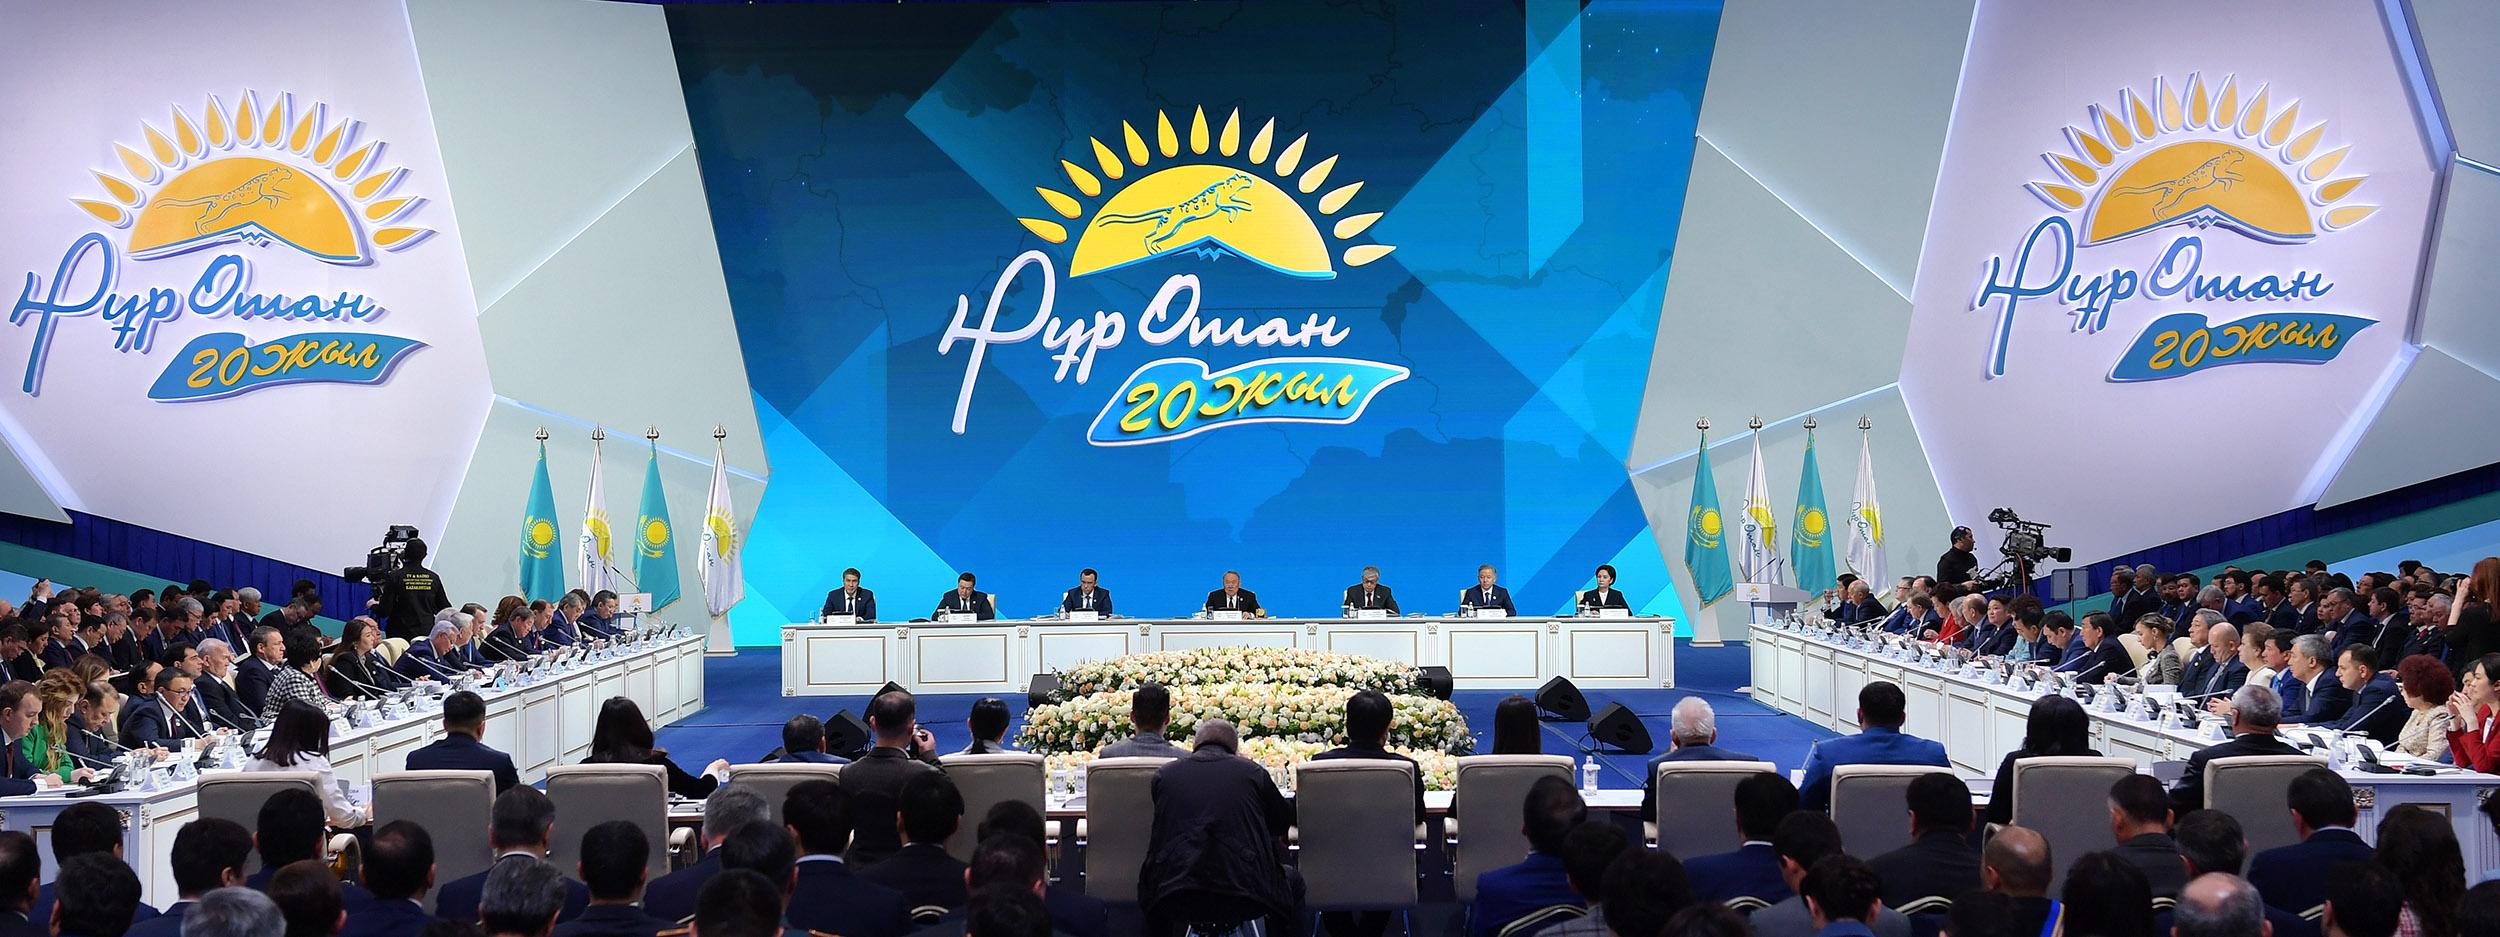 Kazakh President, Nursultan Nazarbayev, Schemes, NewsMobile mobile, news, India, Nur Otan Party